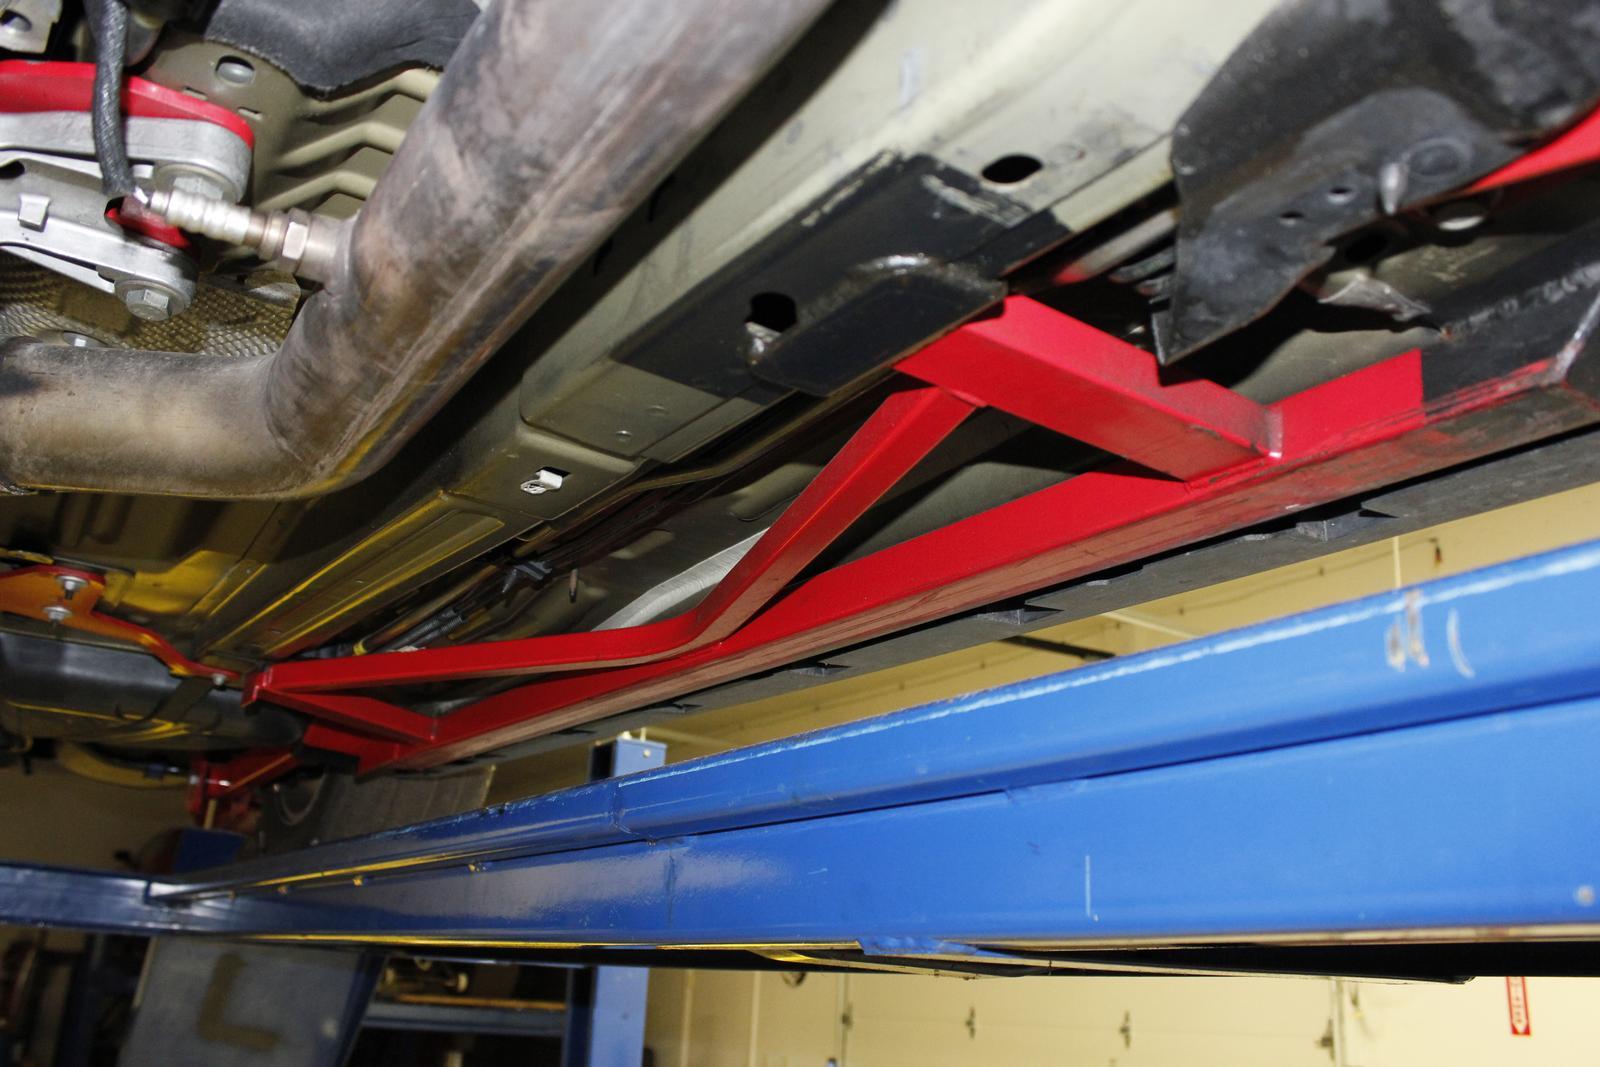 Bmr Suspension Sfc011 Subframe Connectors Weld On